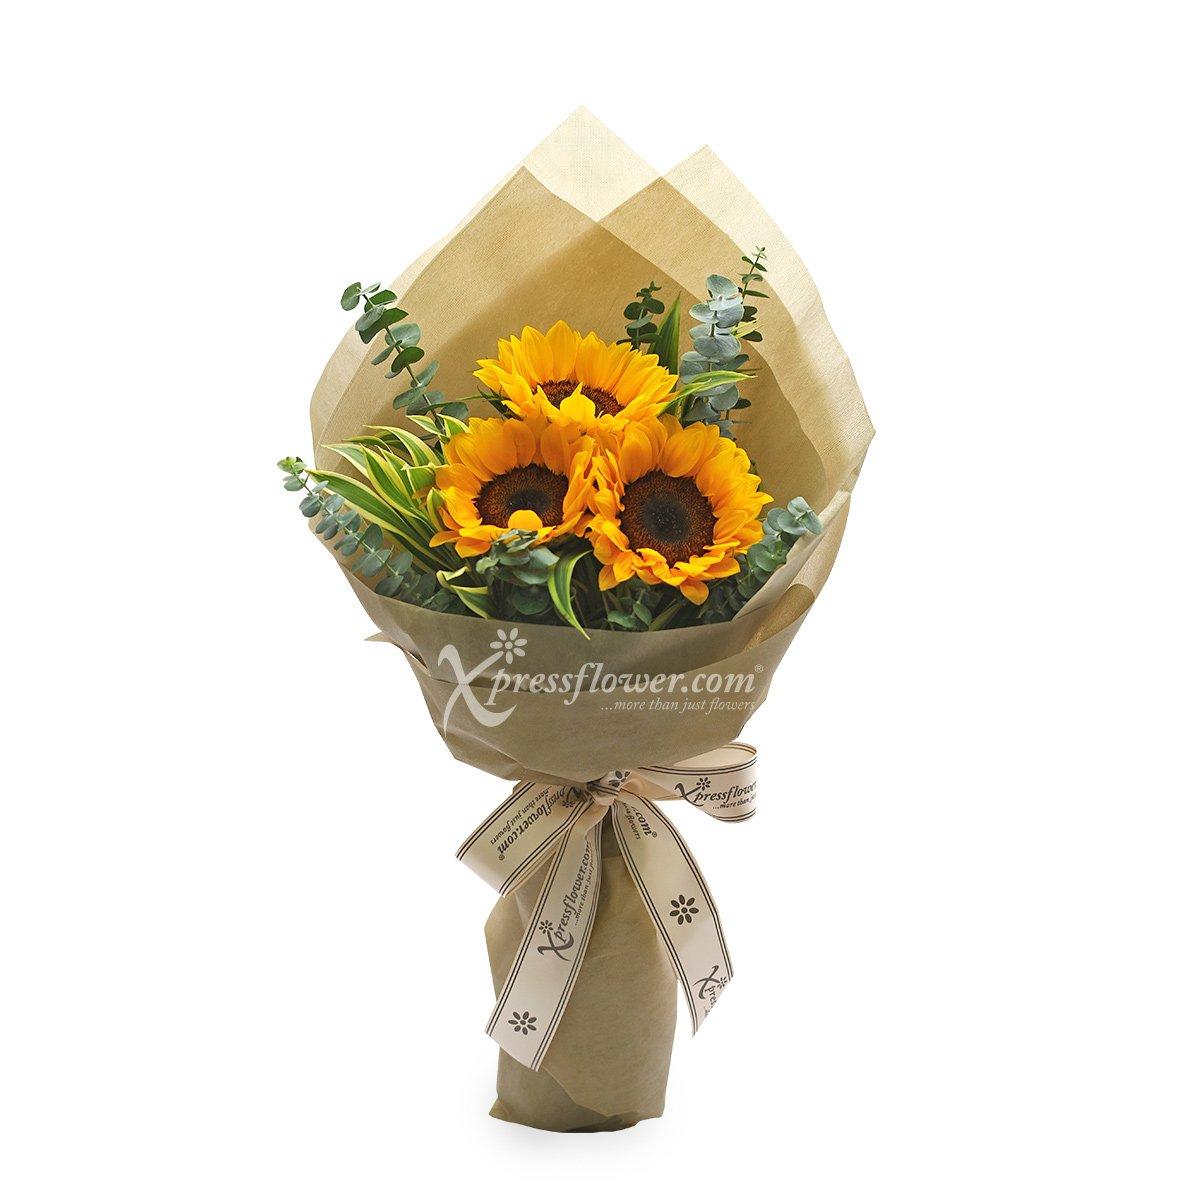 Jubilant Hearts (3 stalk Sunflowers)